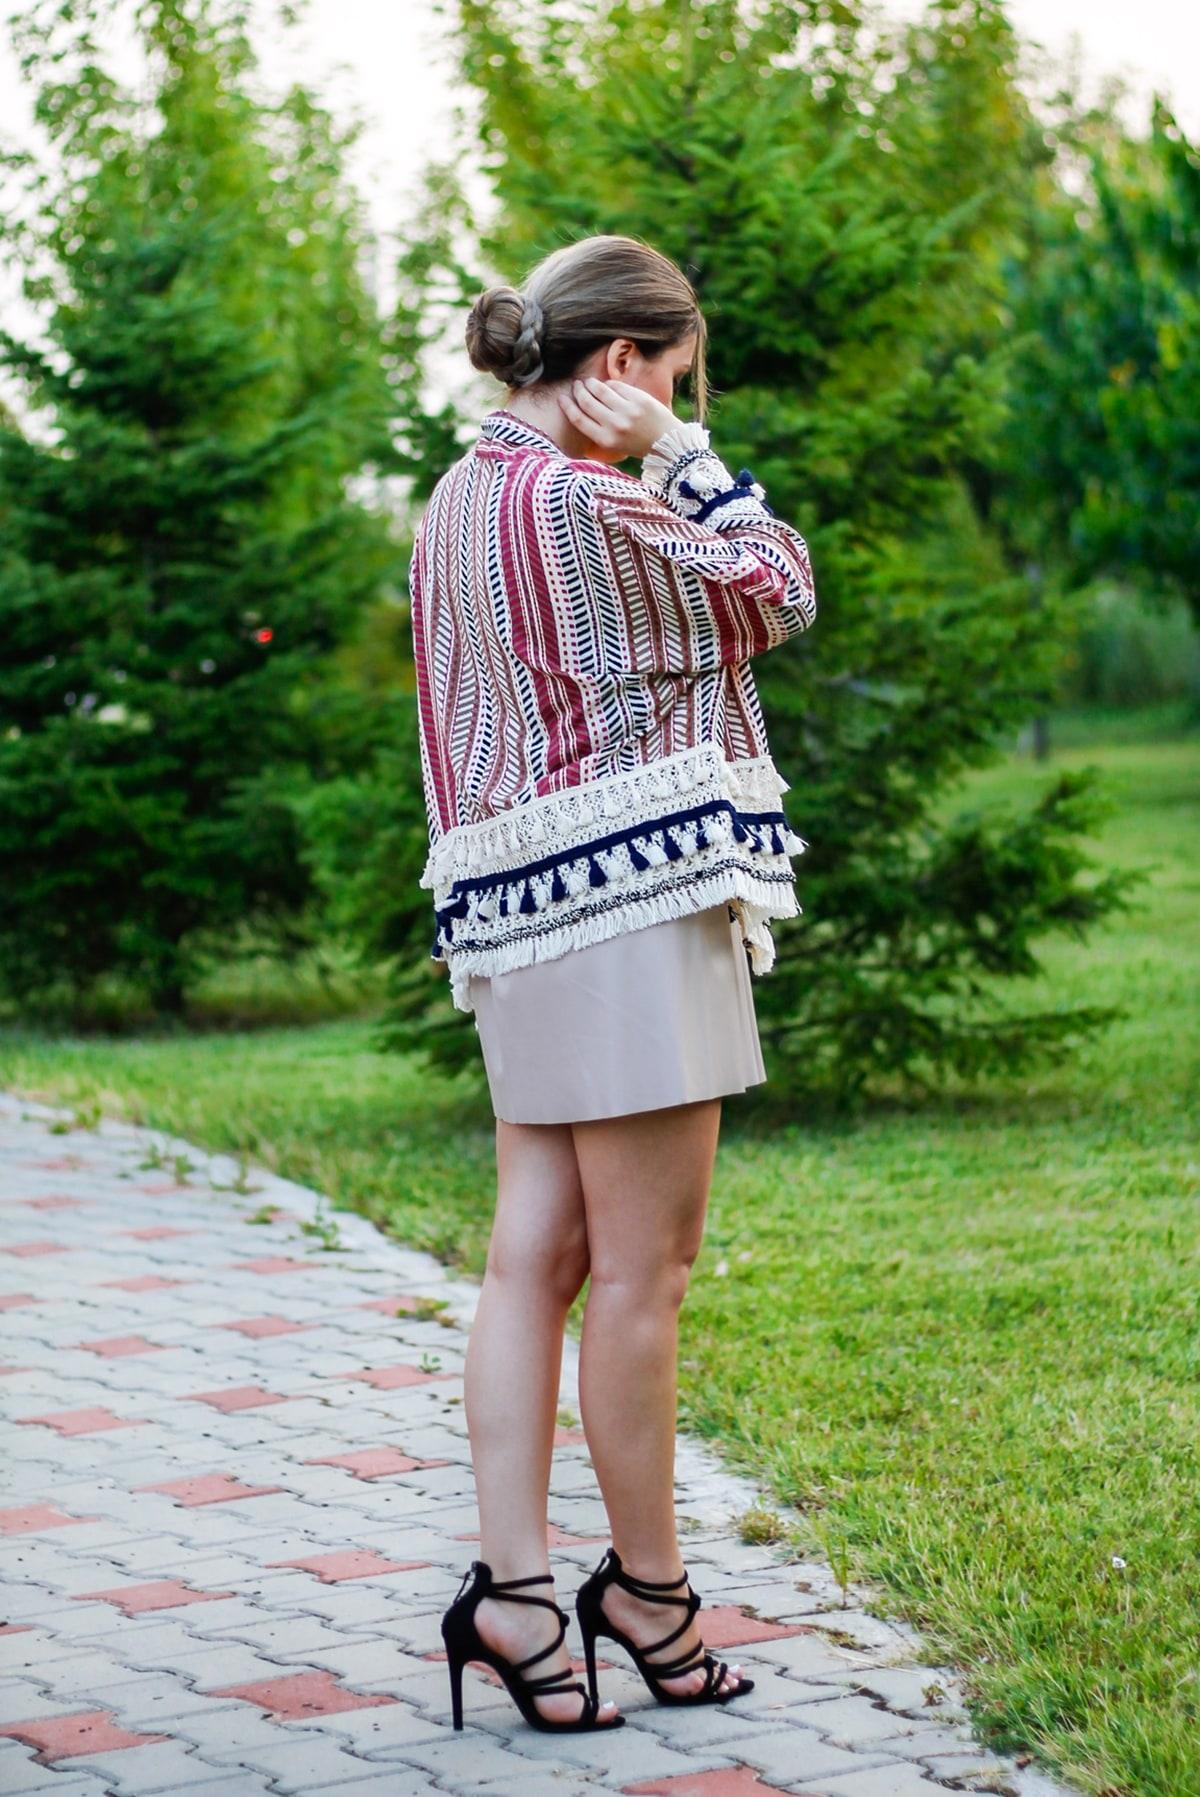 Andreea Ristea - cum purtam kimonoul intr-o tinuta cu fusta eleganta